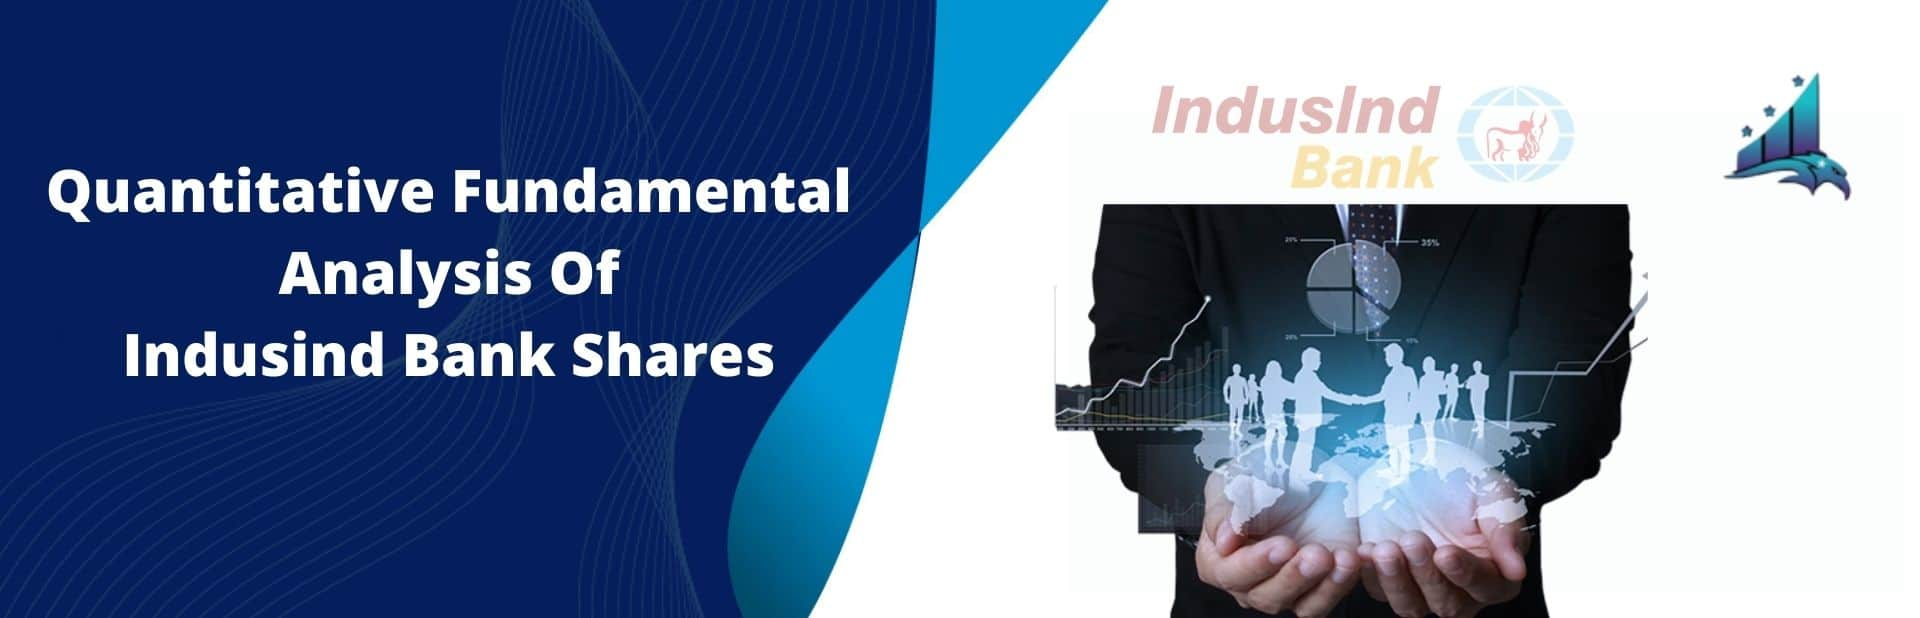 Quantitative Fundamental Analysis of Indusind Bank Shares